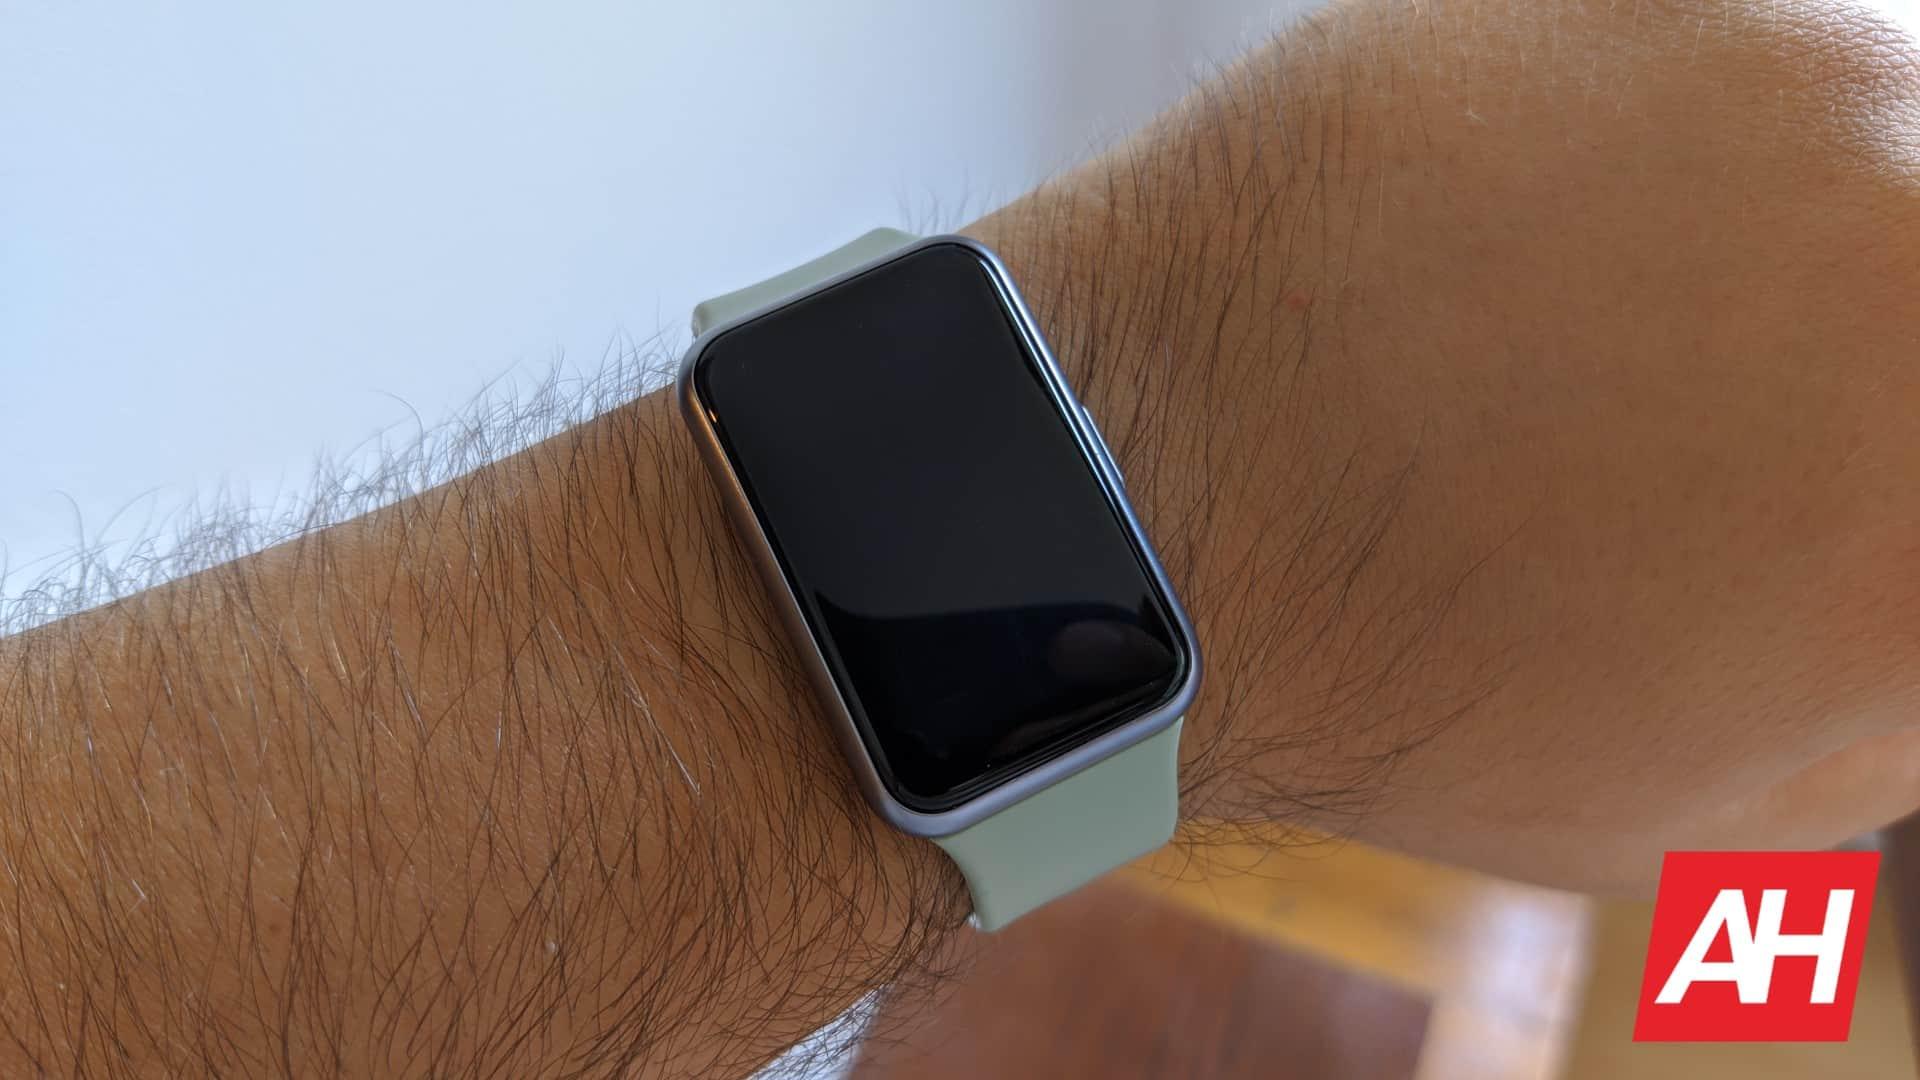 AH Huawei Watch Fit 1